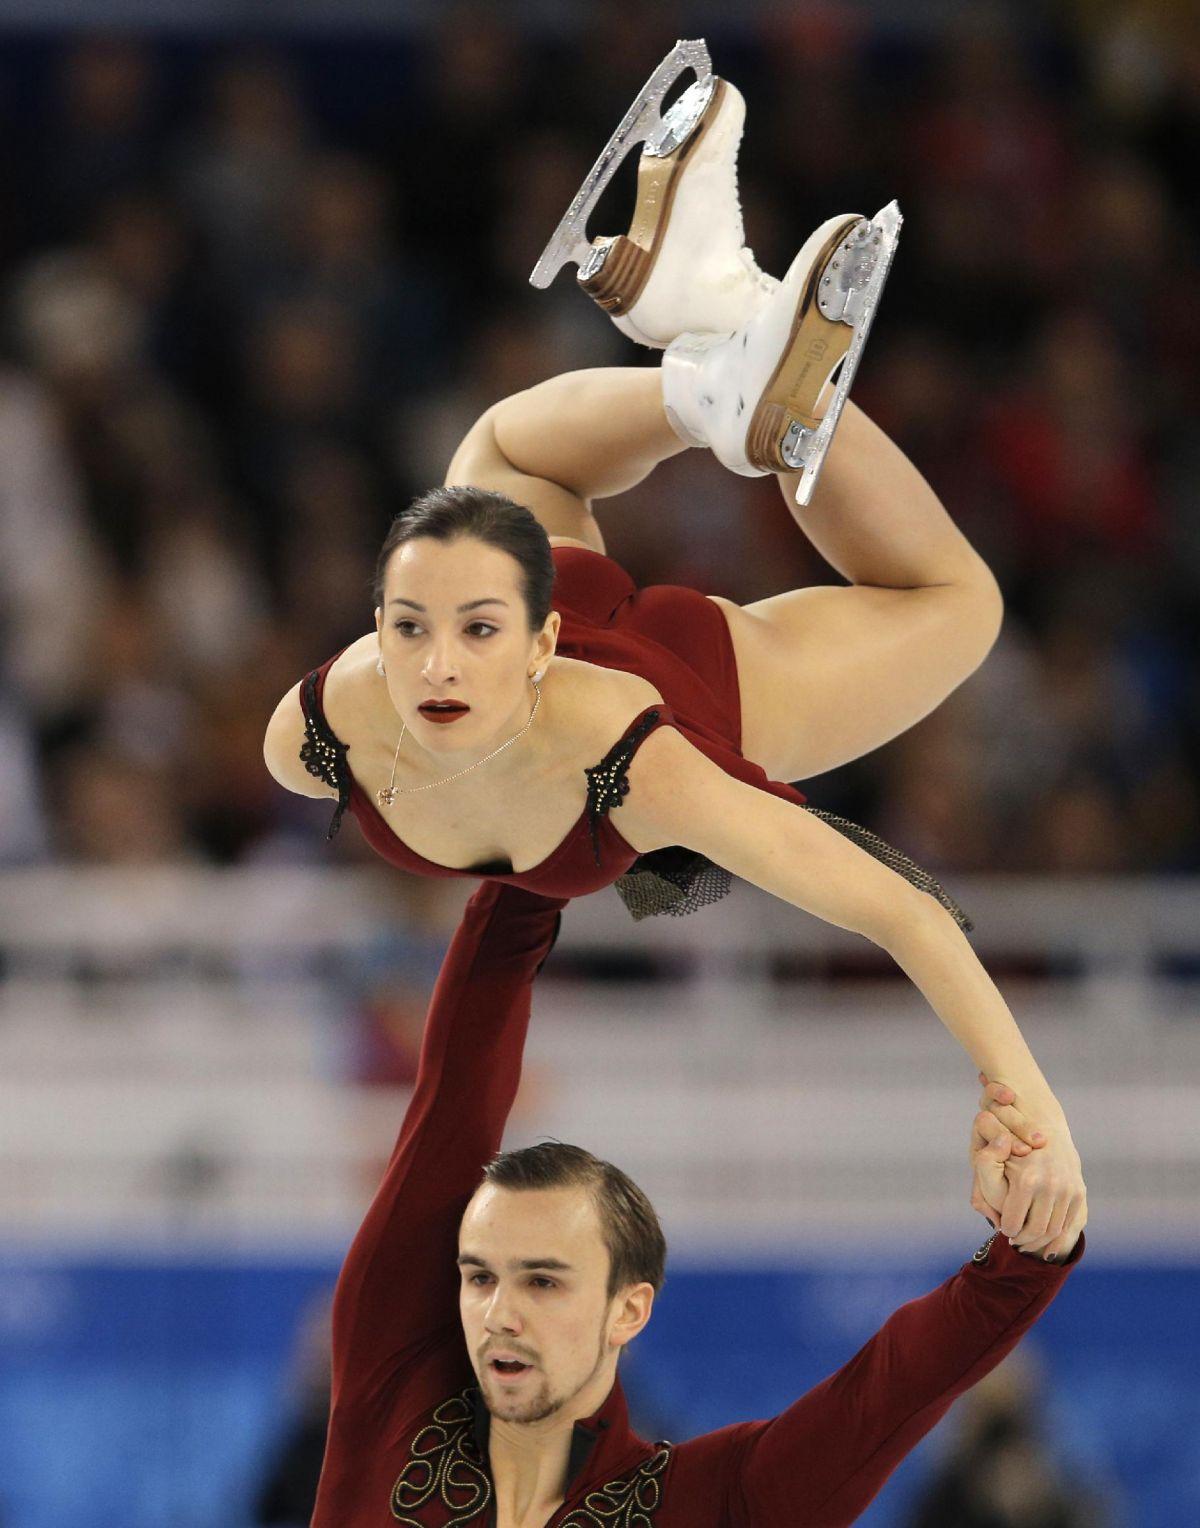 KSENIA STOLBOVA and Fedor Klimov at 2014 Winter Olympics in Sochi